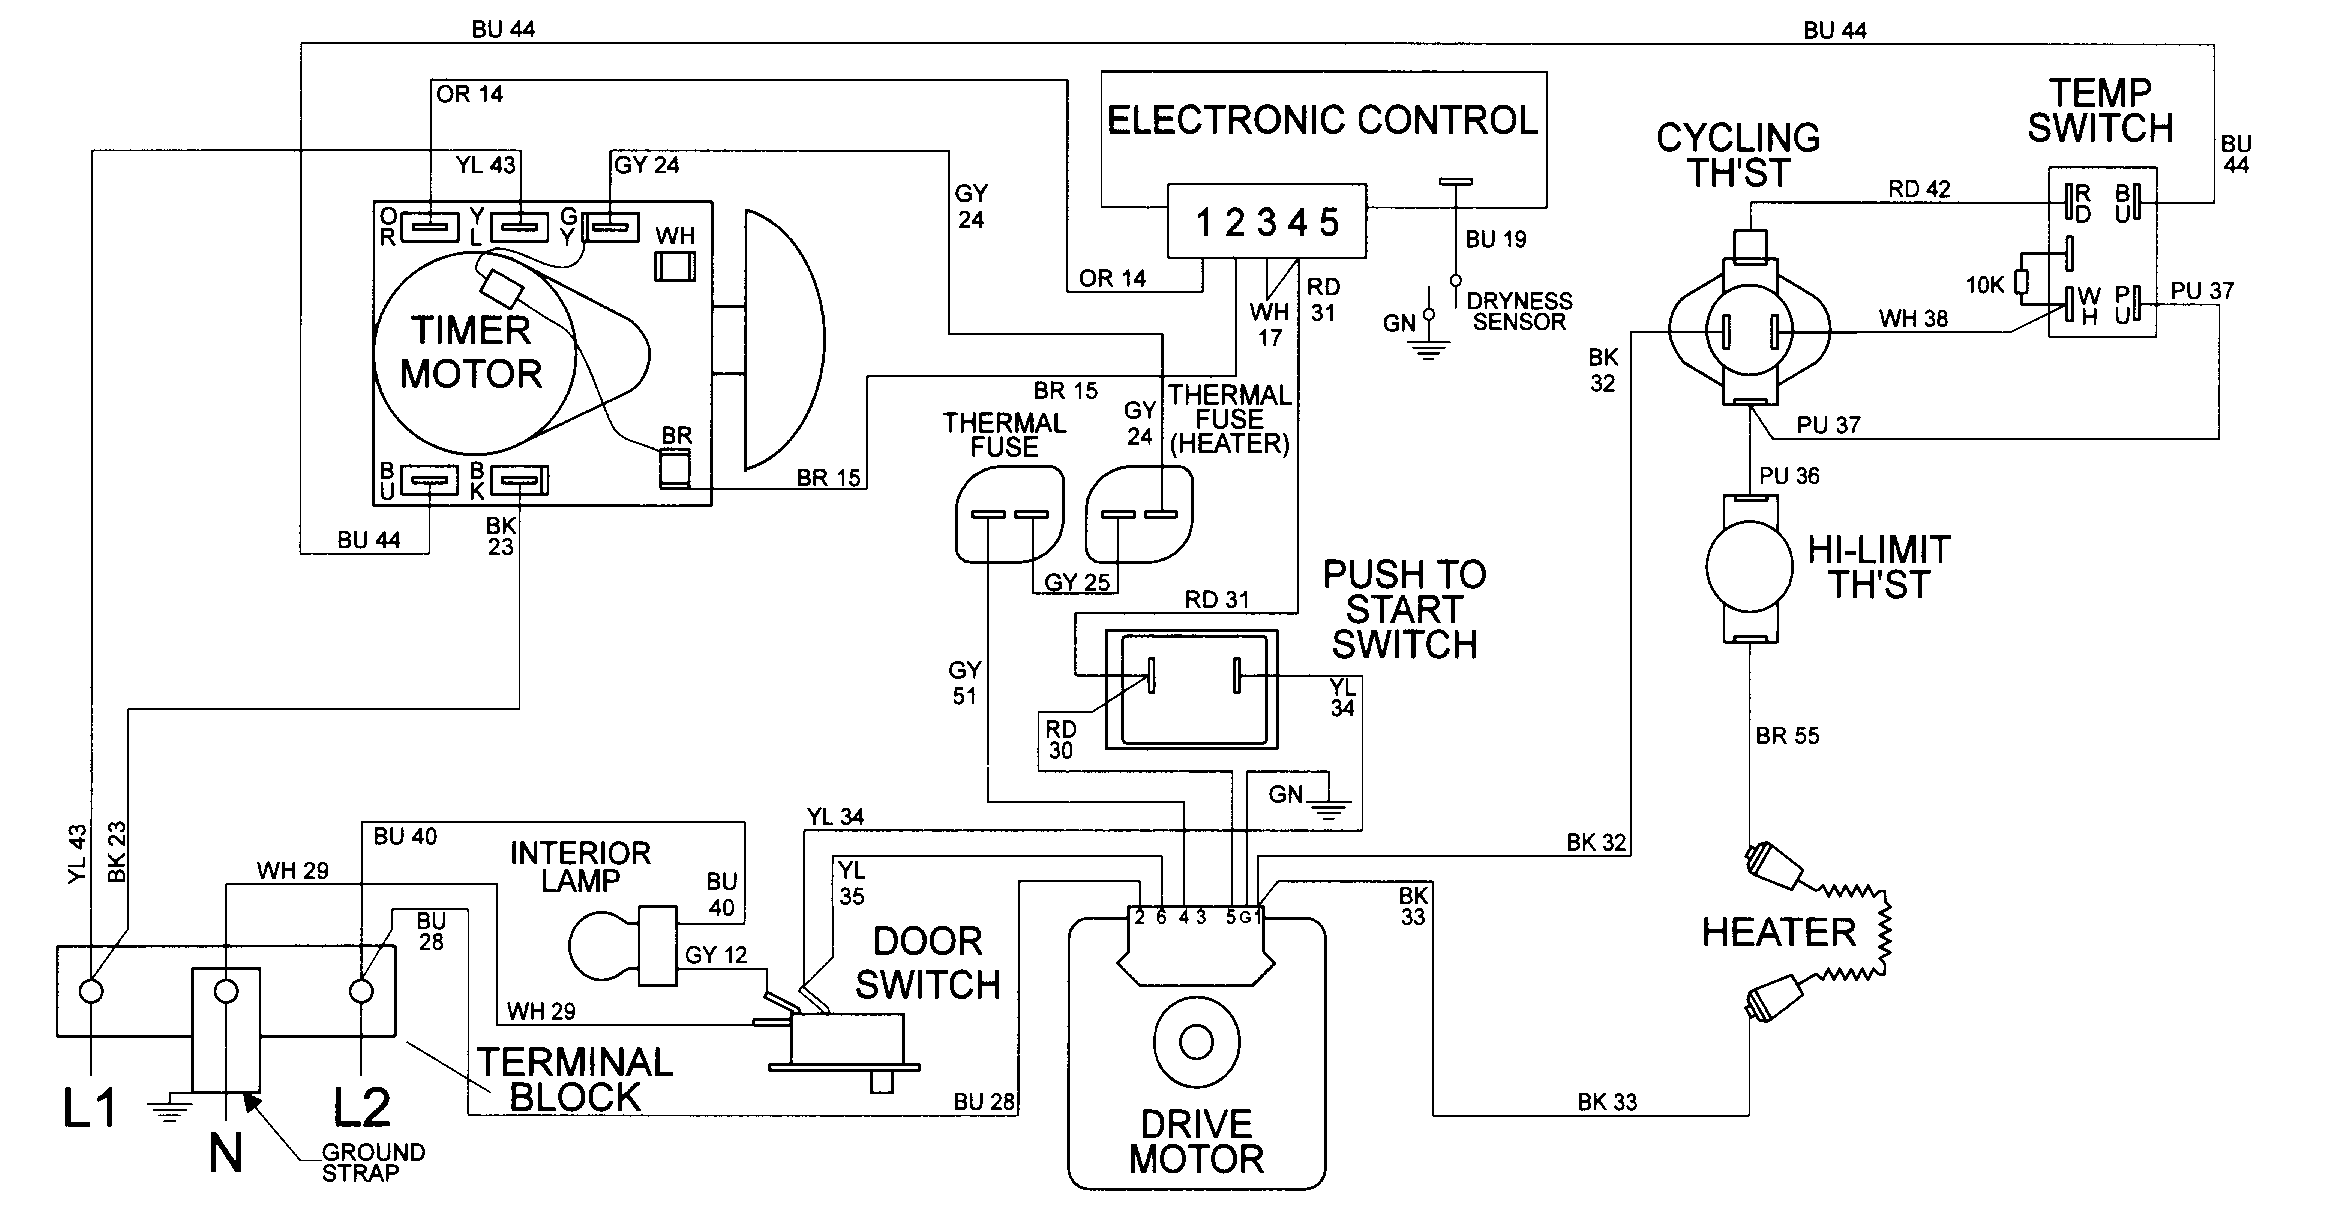 wiring diagram for maytag neptune dryer